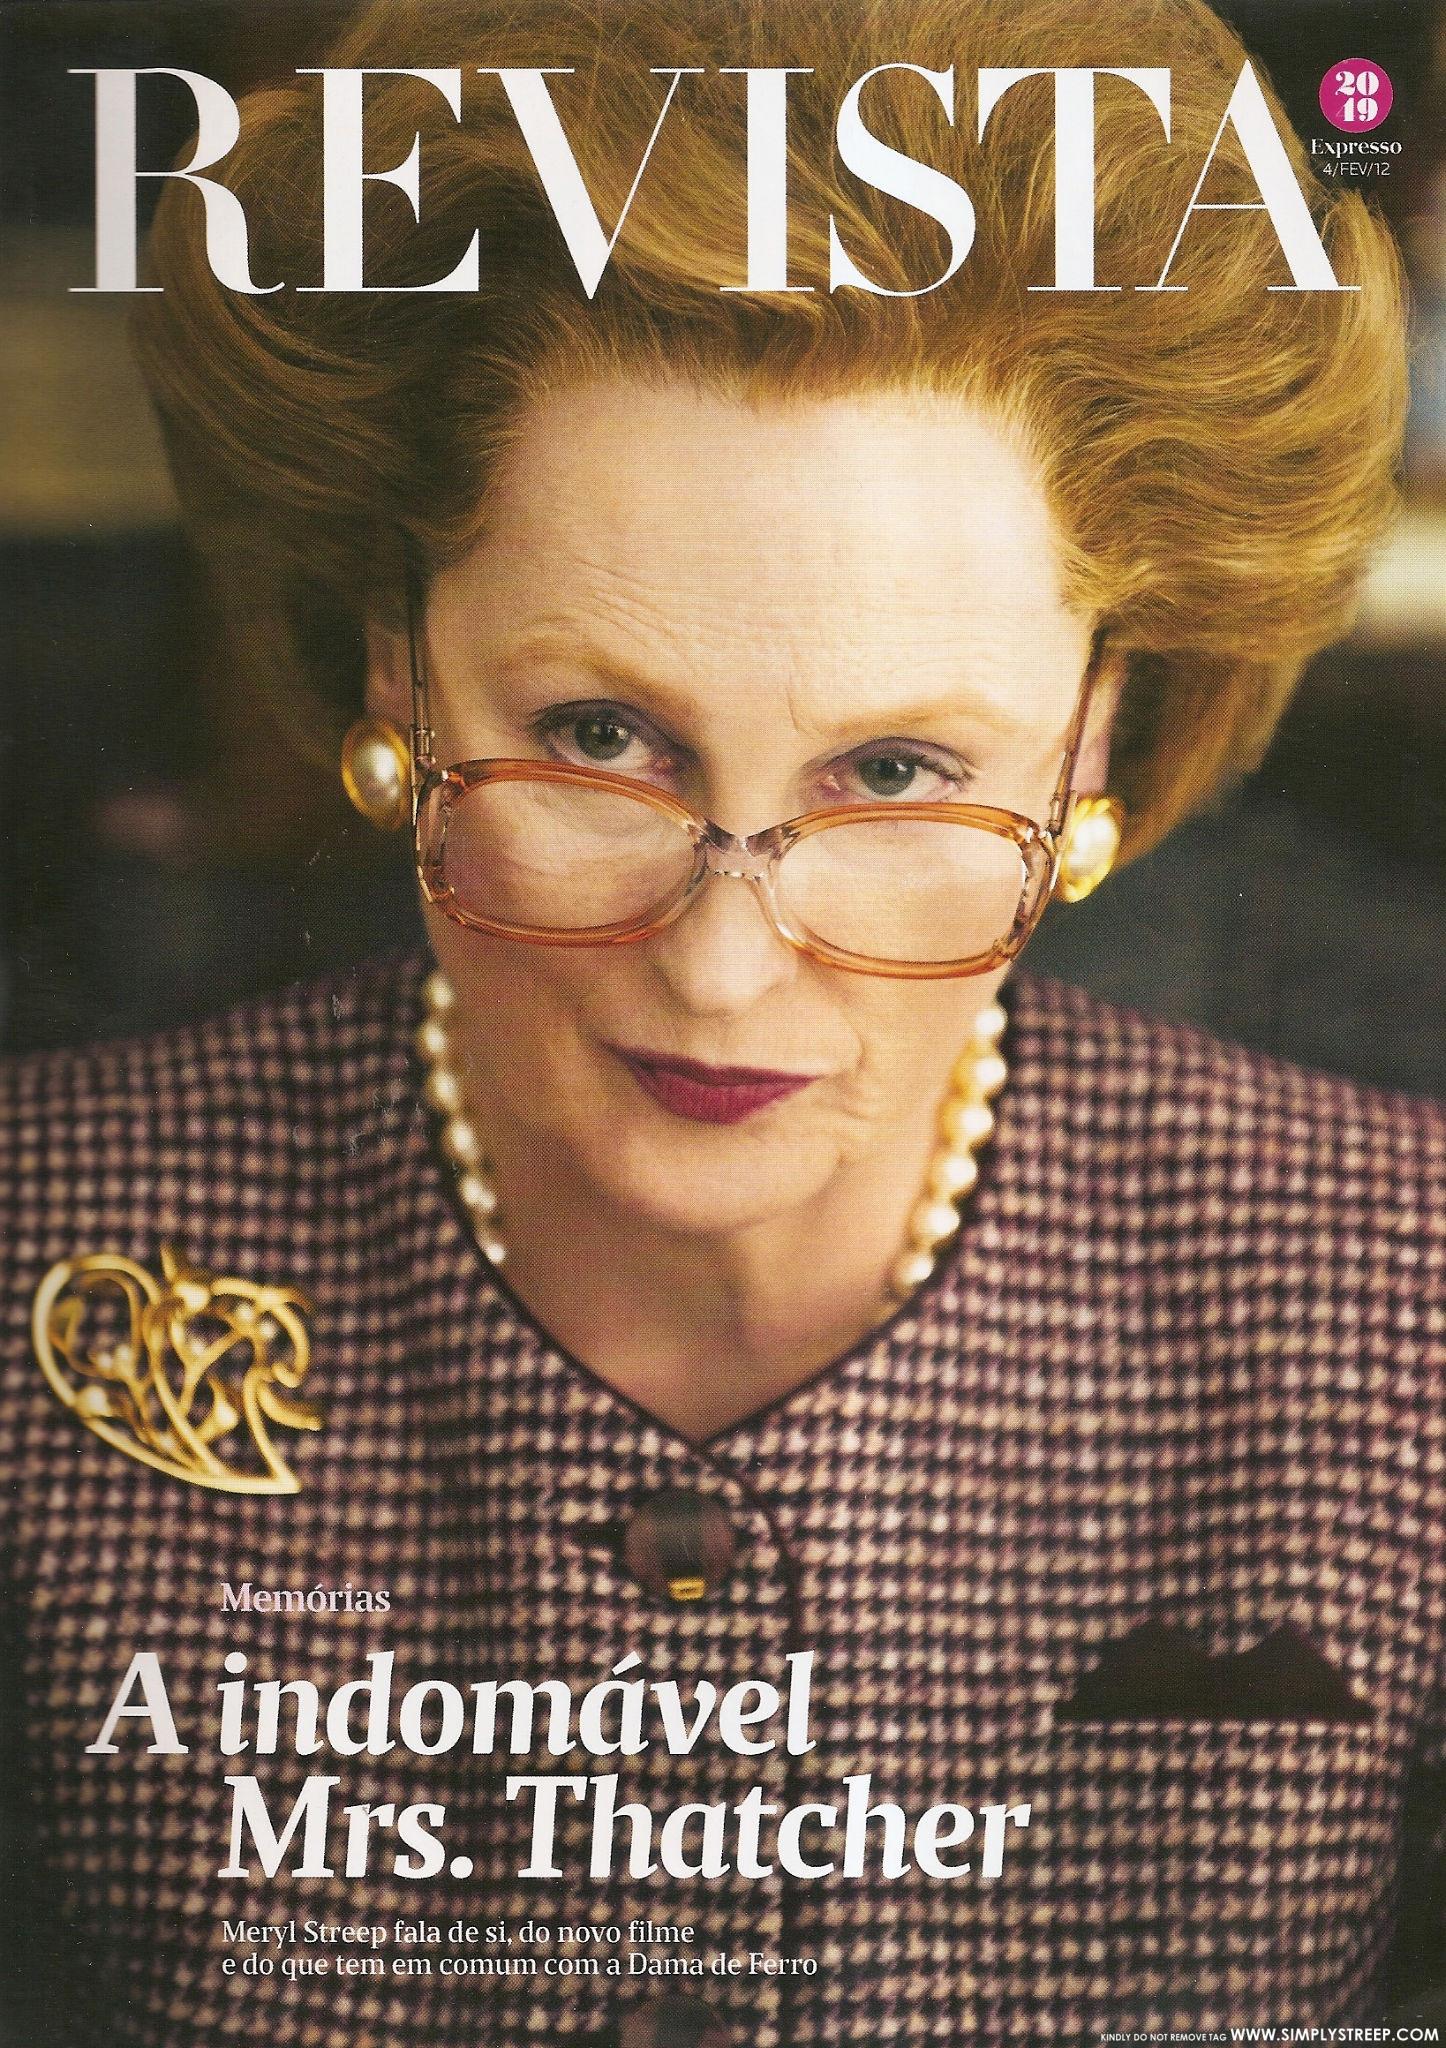 Meryl Streep images Revista Expresso [February 2012] HD wallpaper 1446x2048